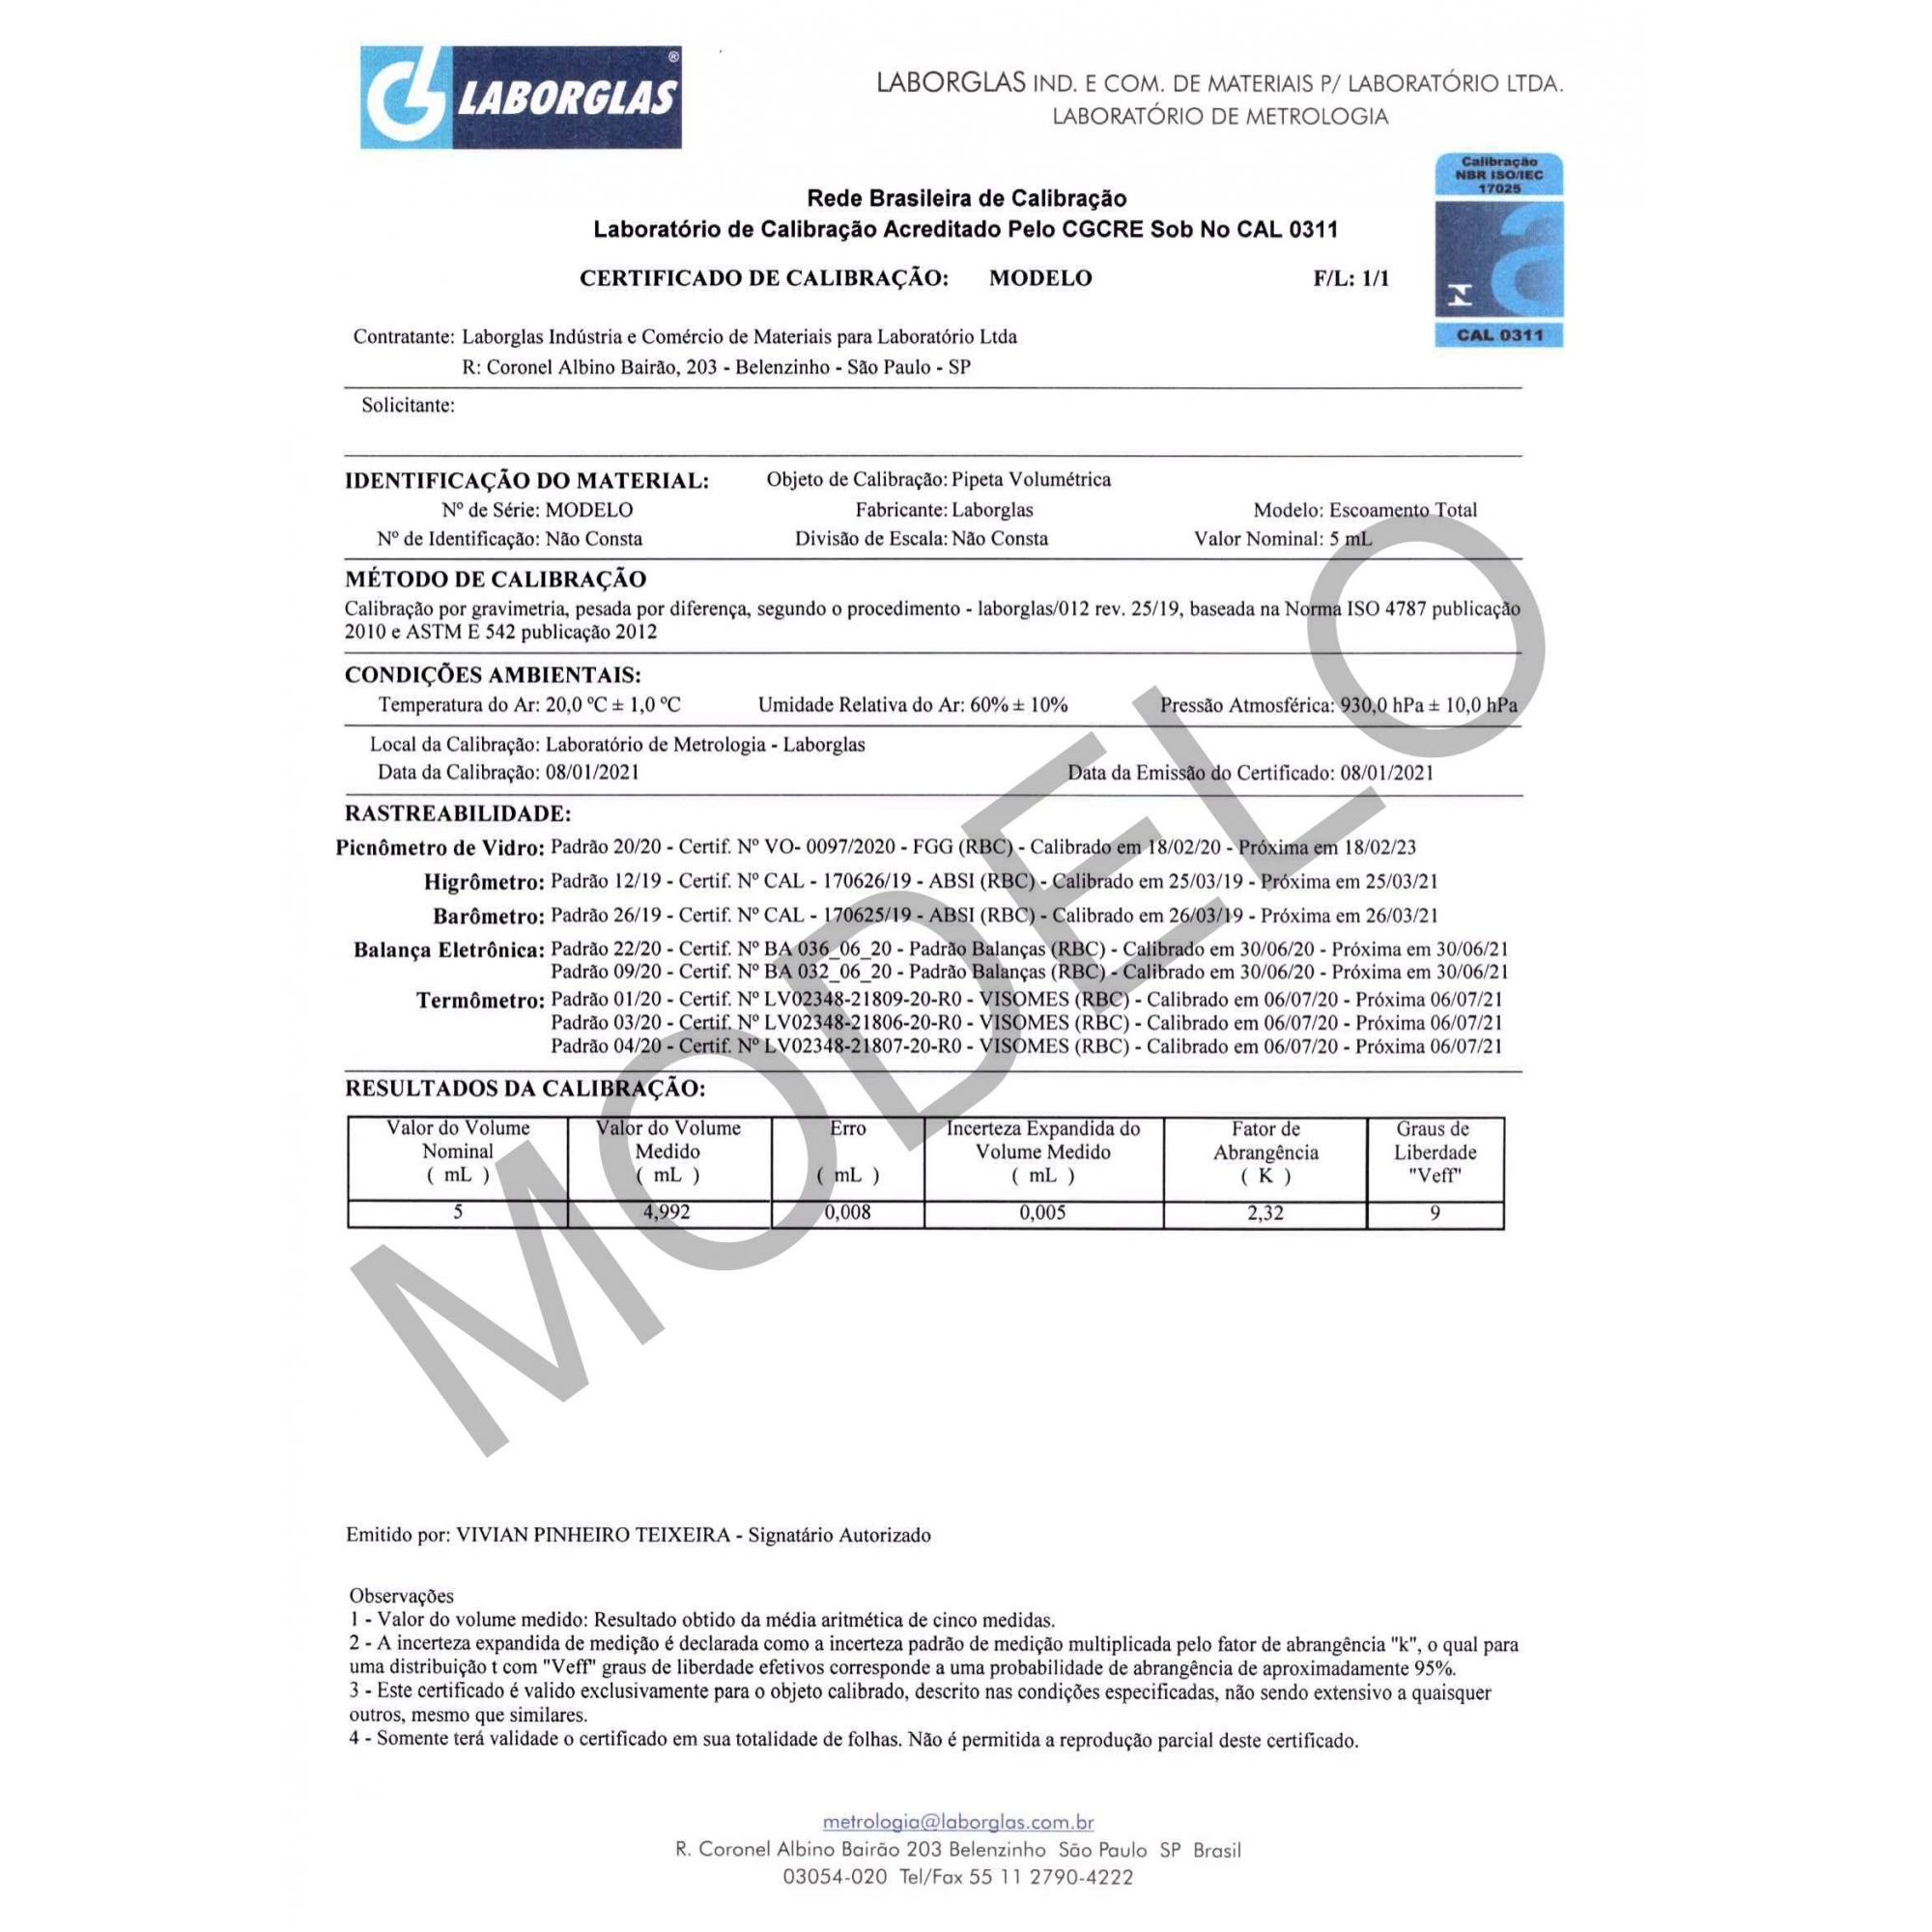 PIPETA VOLUMÉTRICA ESGOTAMENTO TOTAL 0,5 ML CERTIFICADO RBC - Laborglas - Cód. 9433701-R